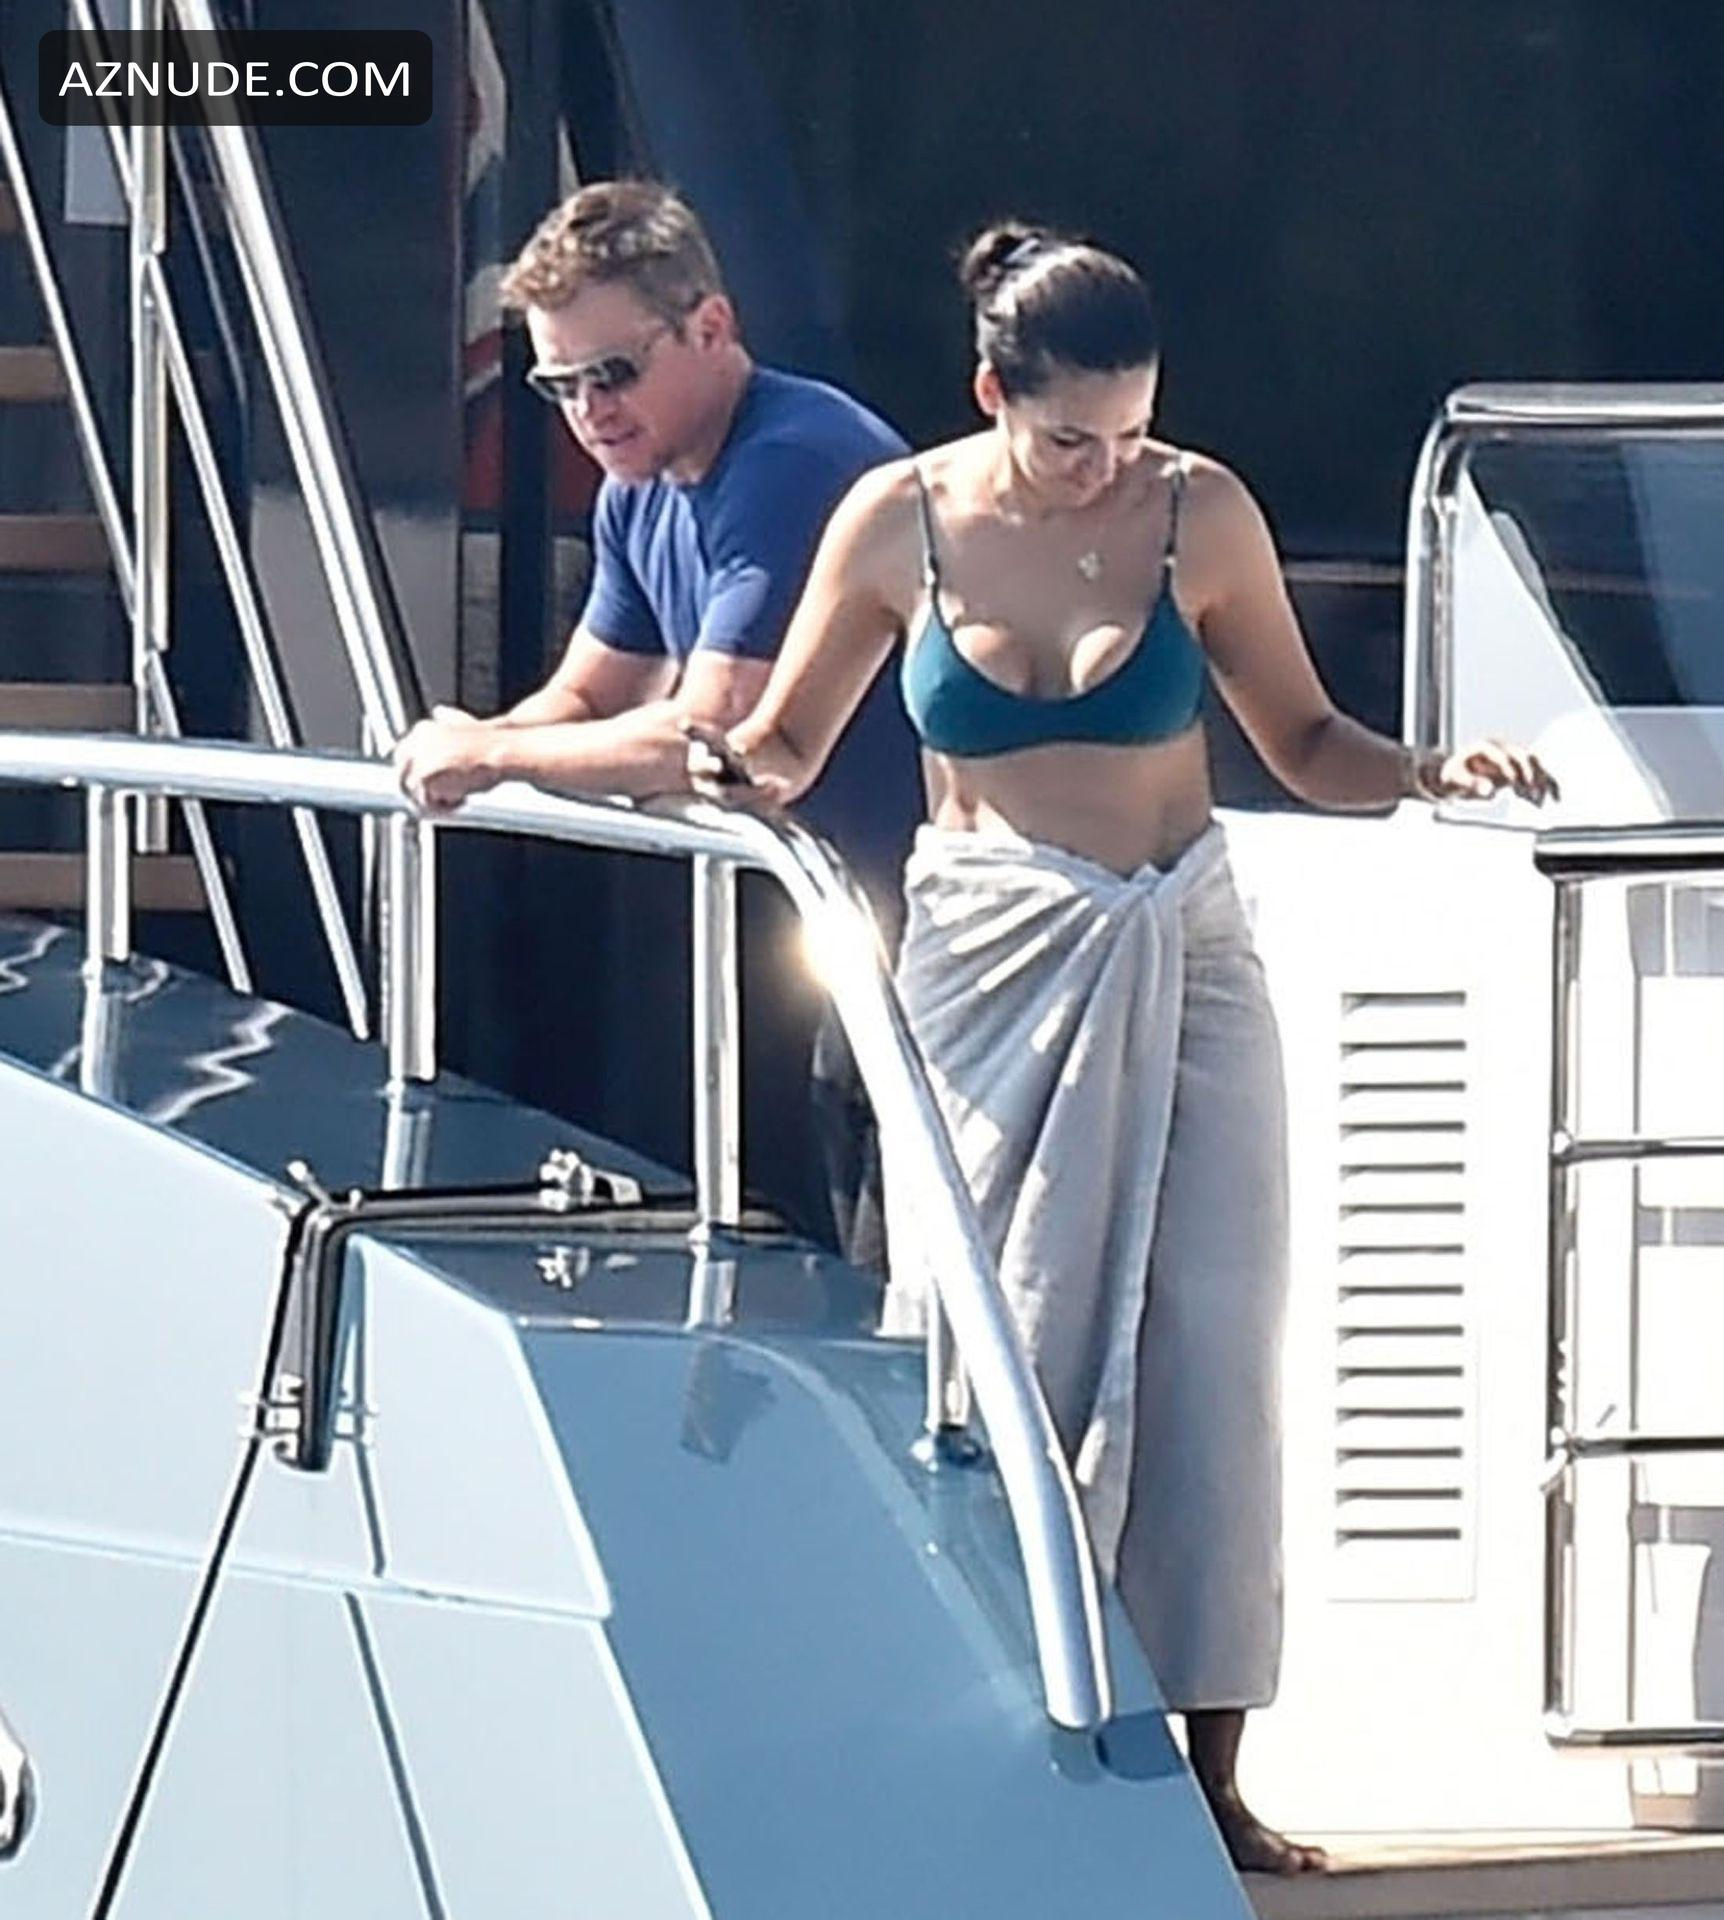 Swimwear Luciana Damon Nude Pictures